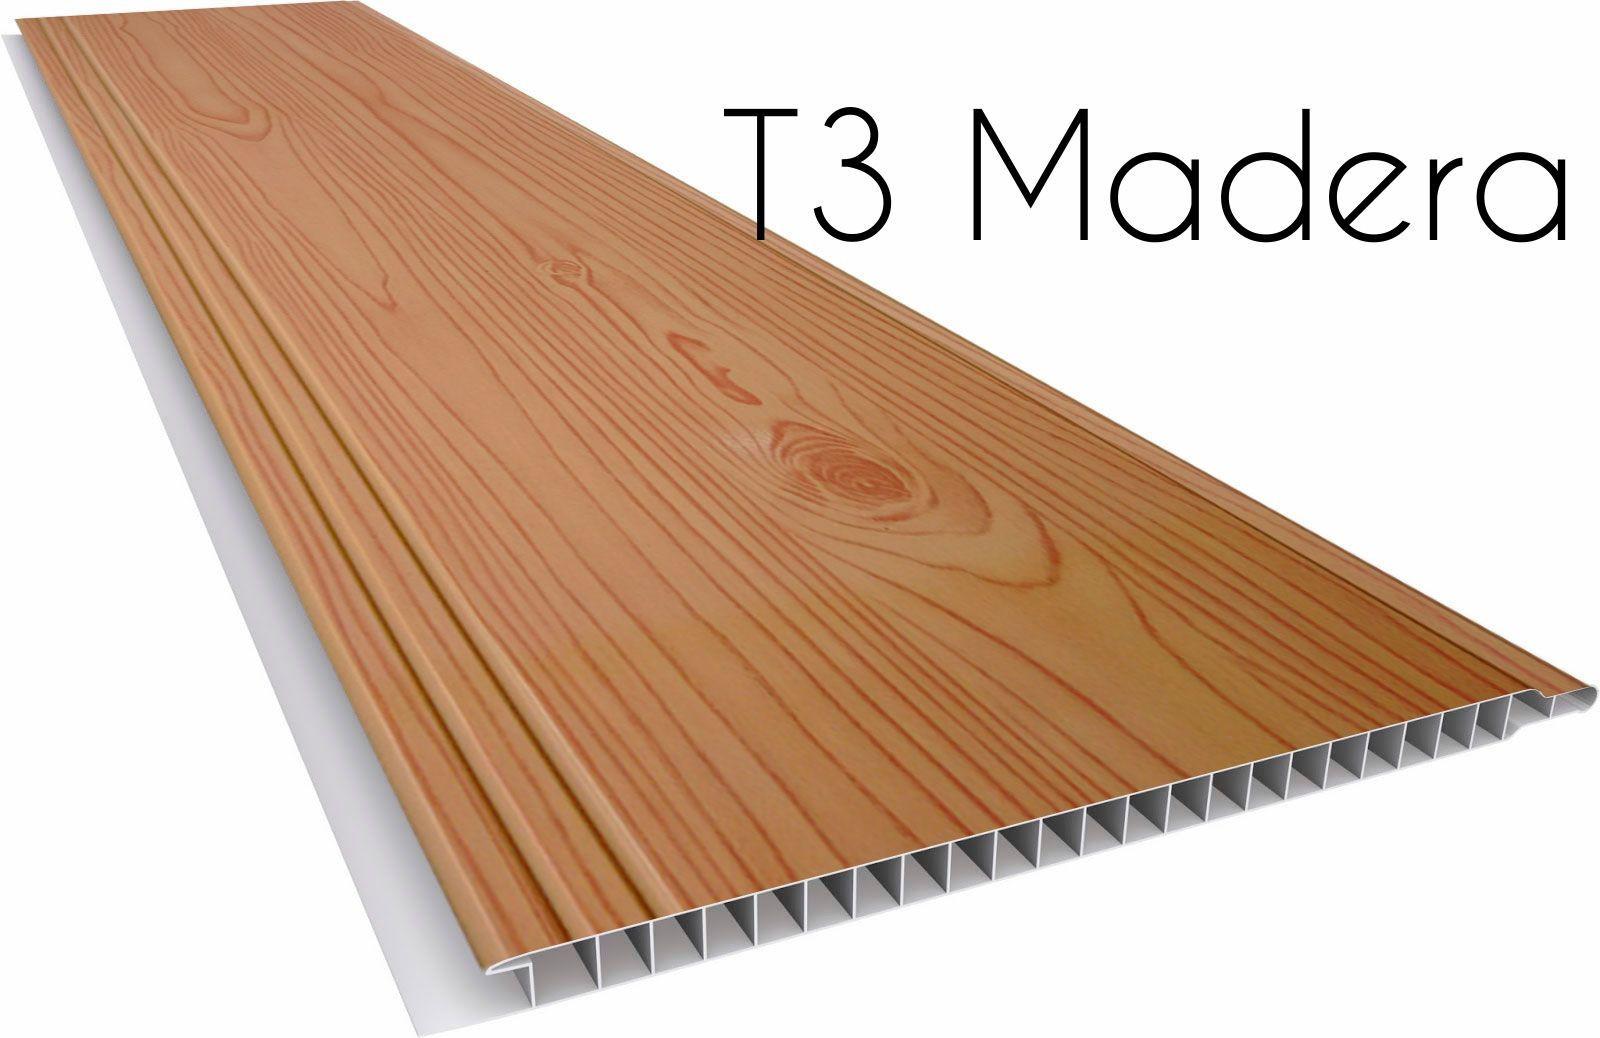 Pvc Building Material , Interior Decoration Wood Design Plafond Pvc Panels Ceiling